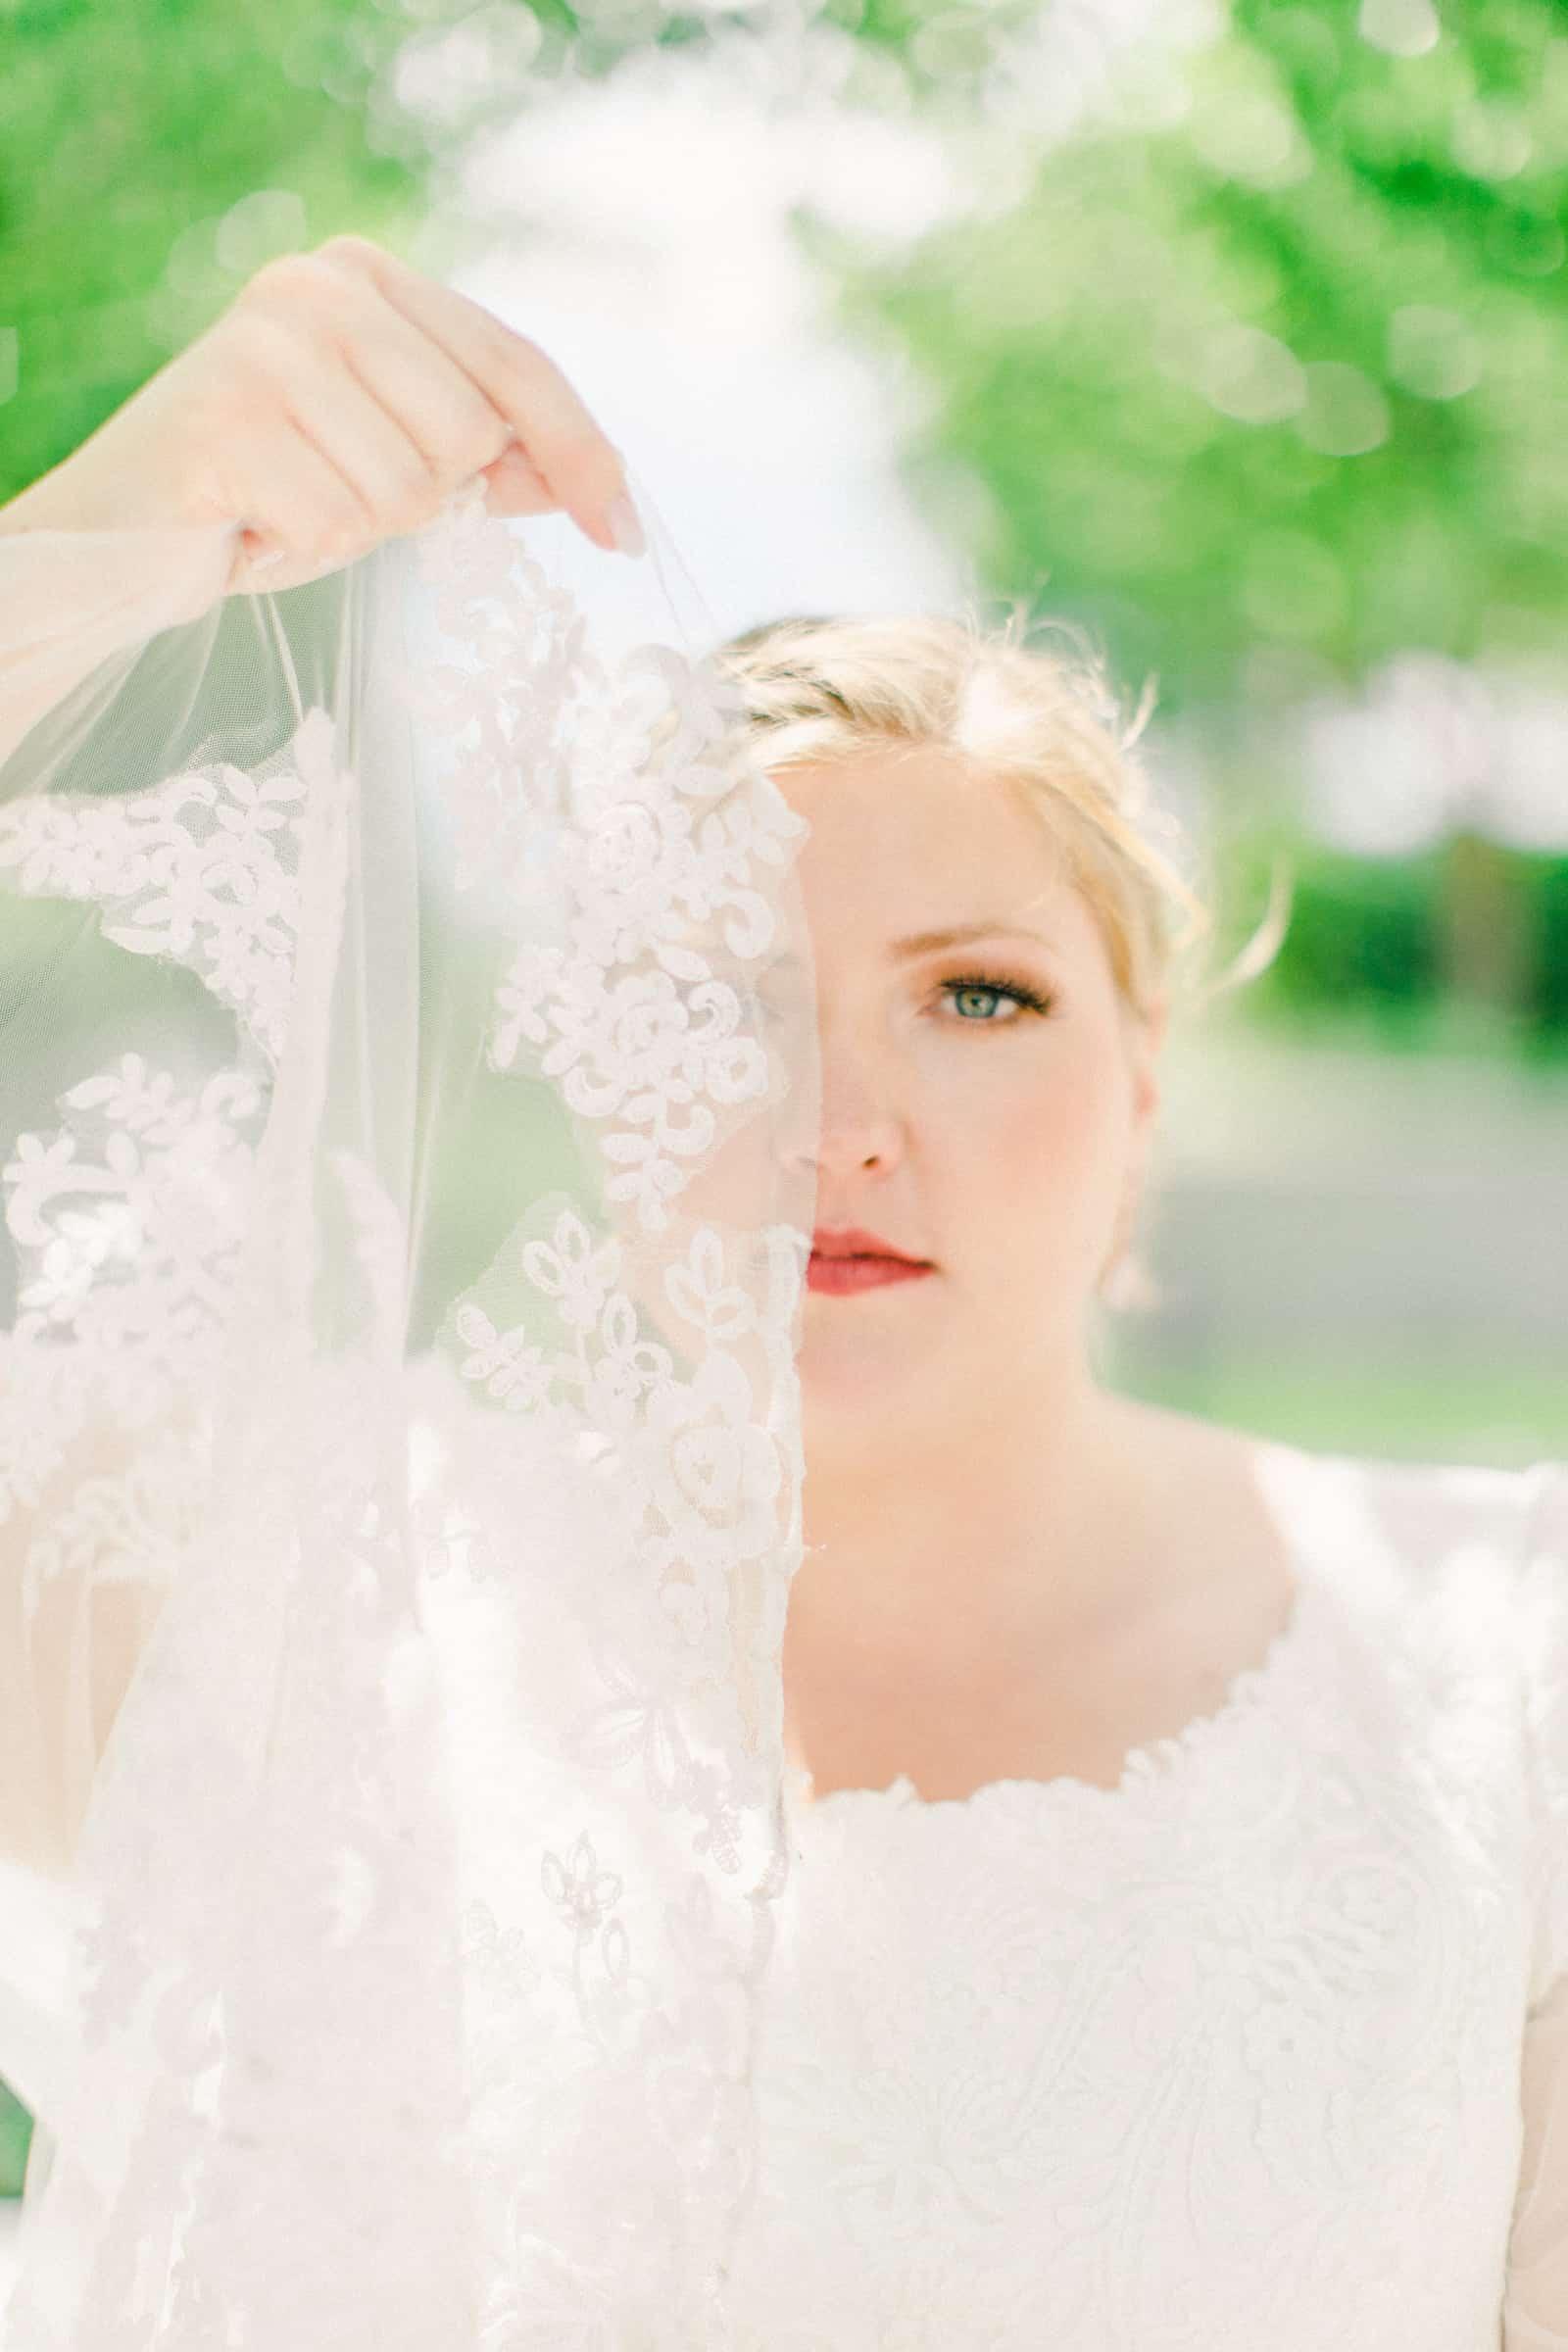 Draper LDS Temple Wedding, Utah wedding photography, summer backyard wedding, modest lace wedding dress with long veil